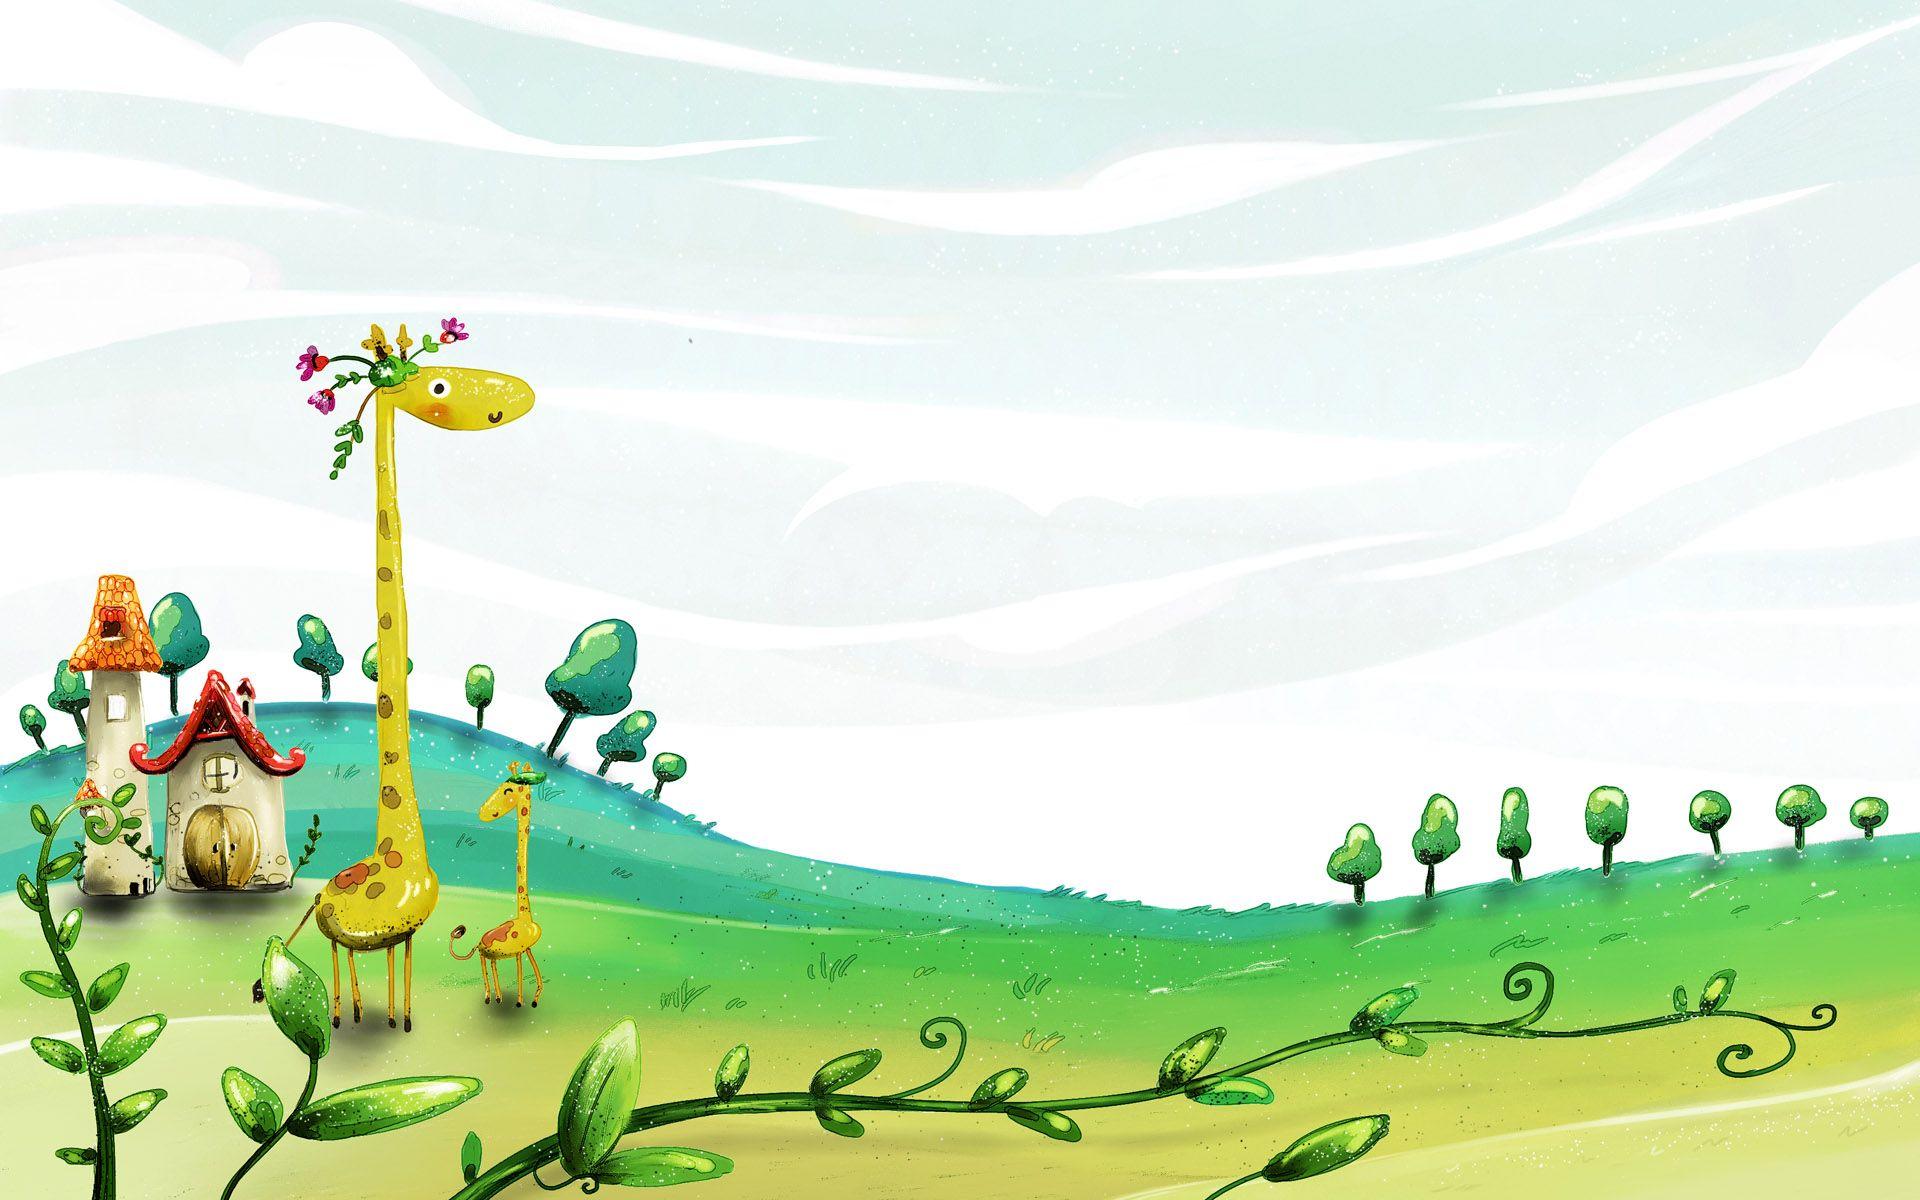 Spring Wallpaper Cute Wallpaper Backgrounds Cartoon Wallpaper Spring Desktop Wallpaper